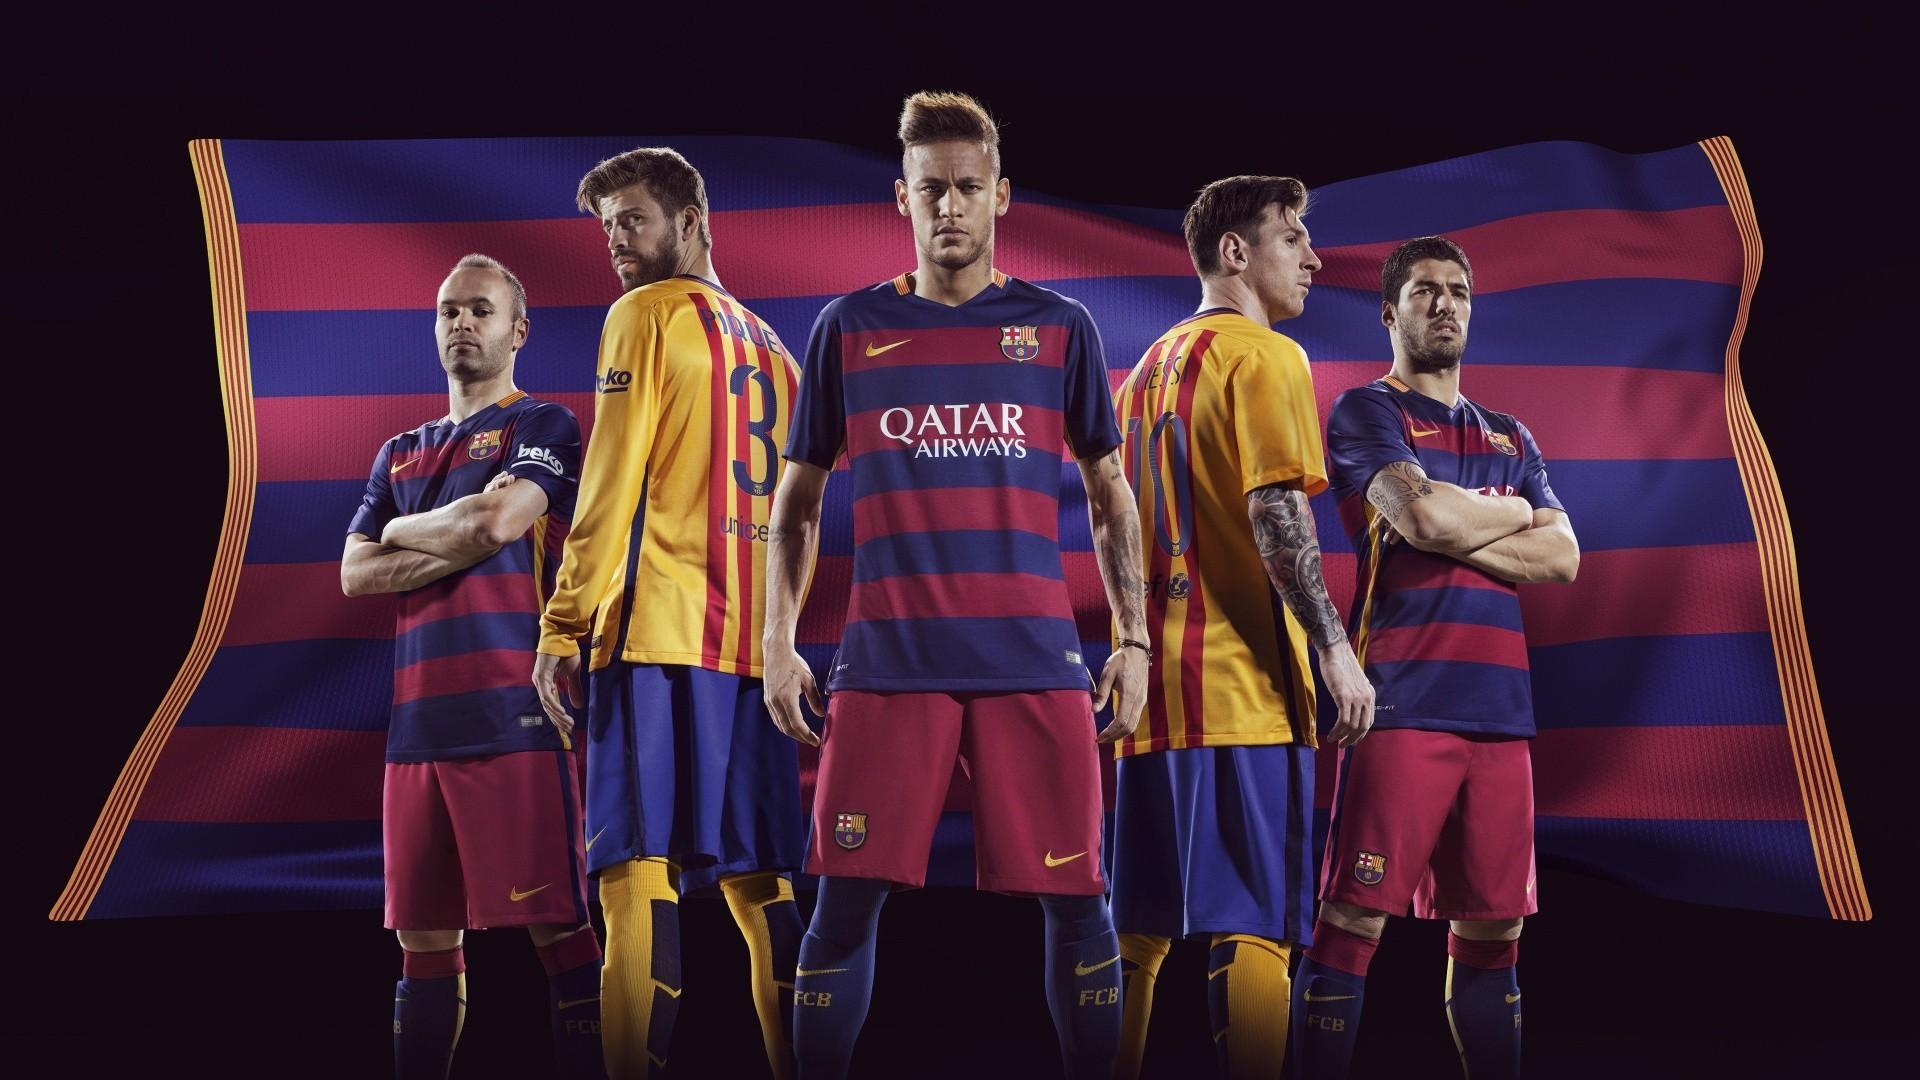 Wonderful Fc Barcelona Neymar And Messi Wallpaper SDH4